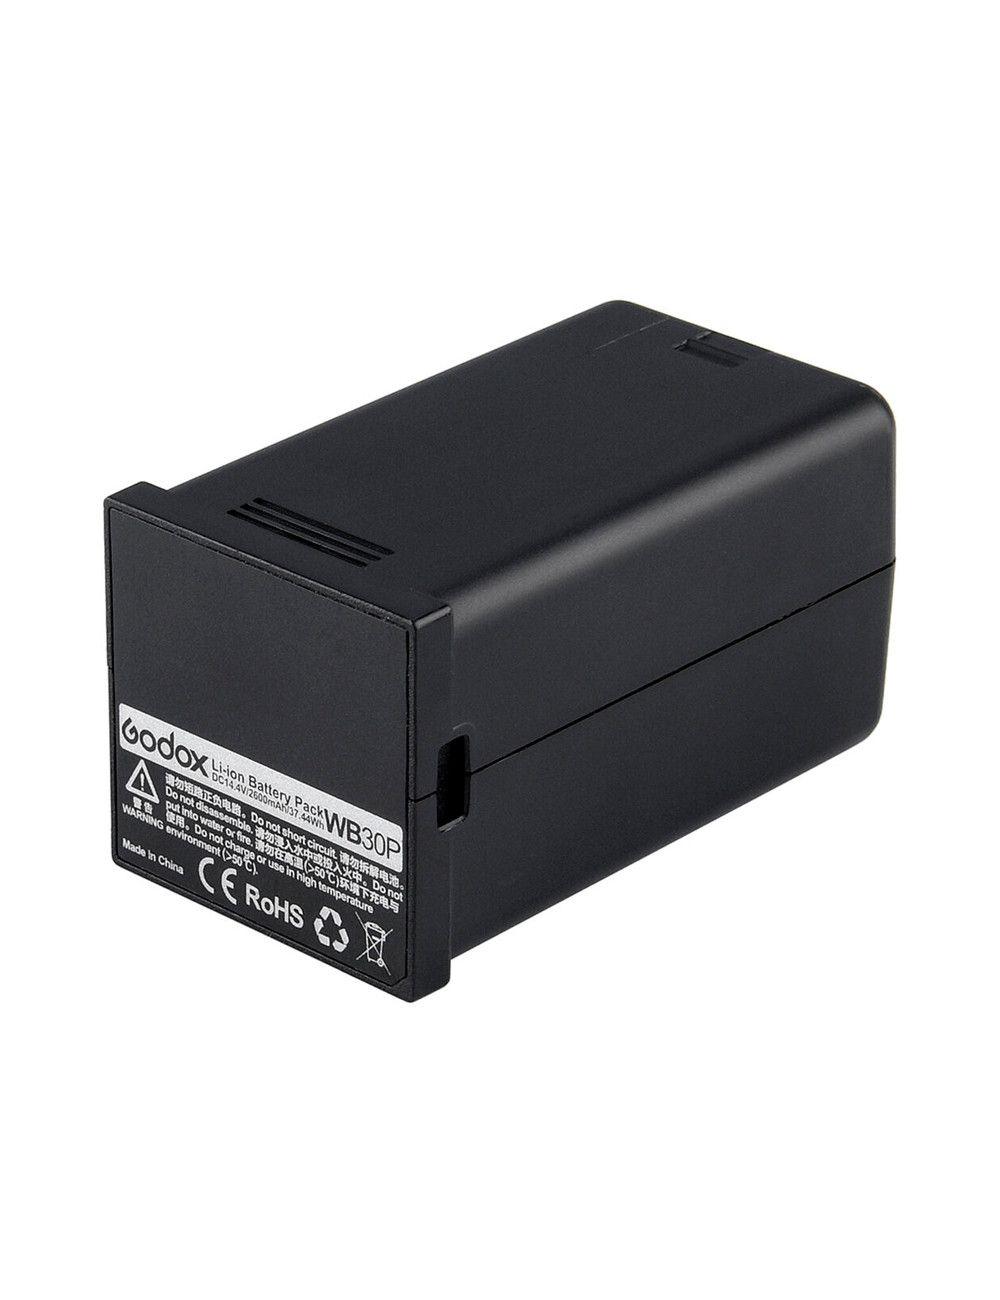 Rode NT-USB Micrófono Condensador USB